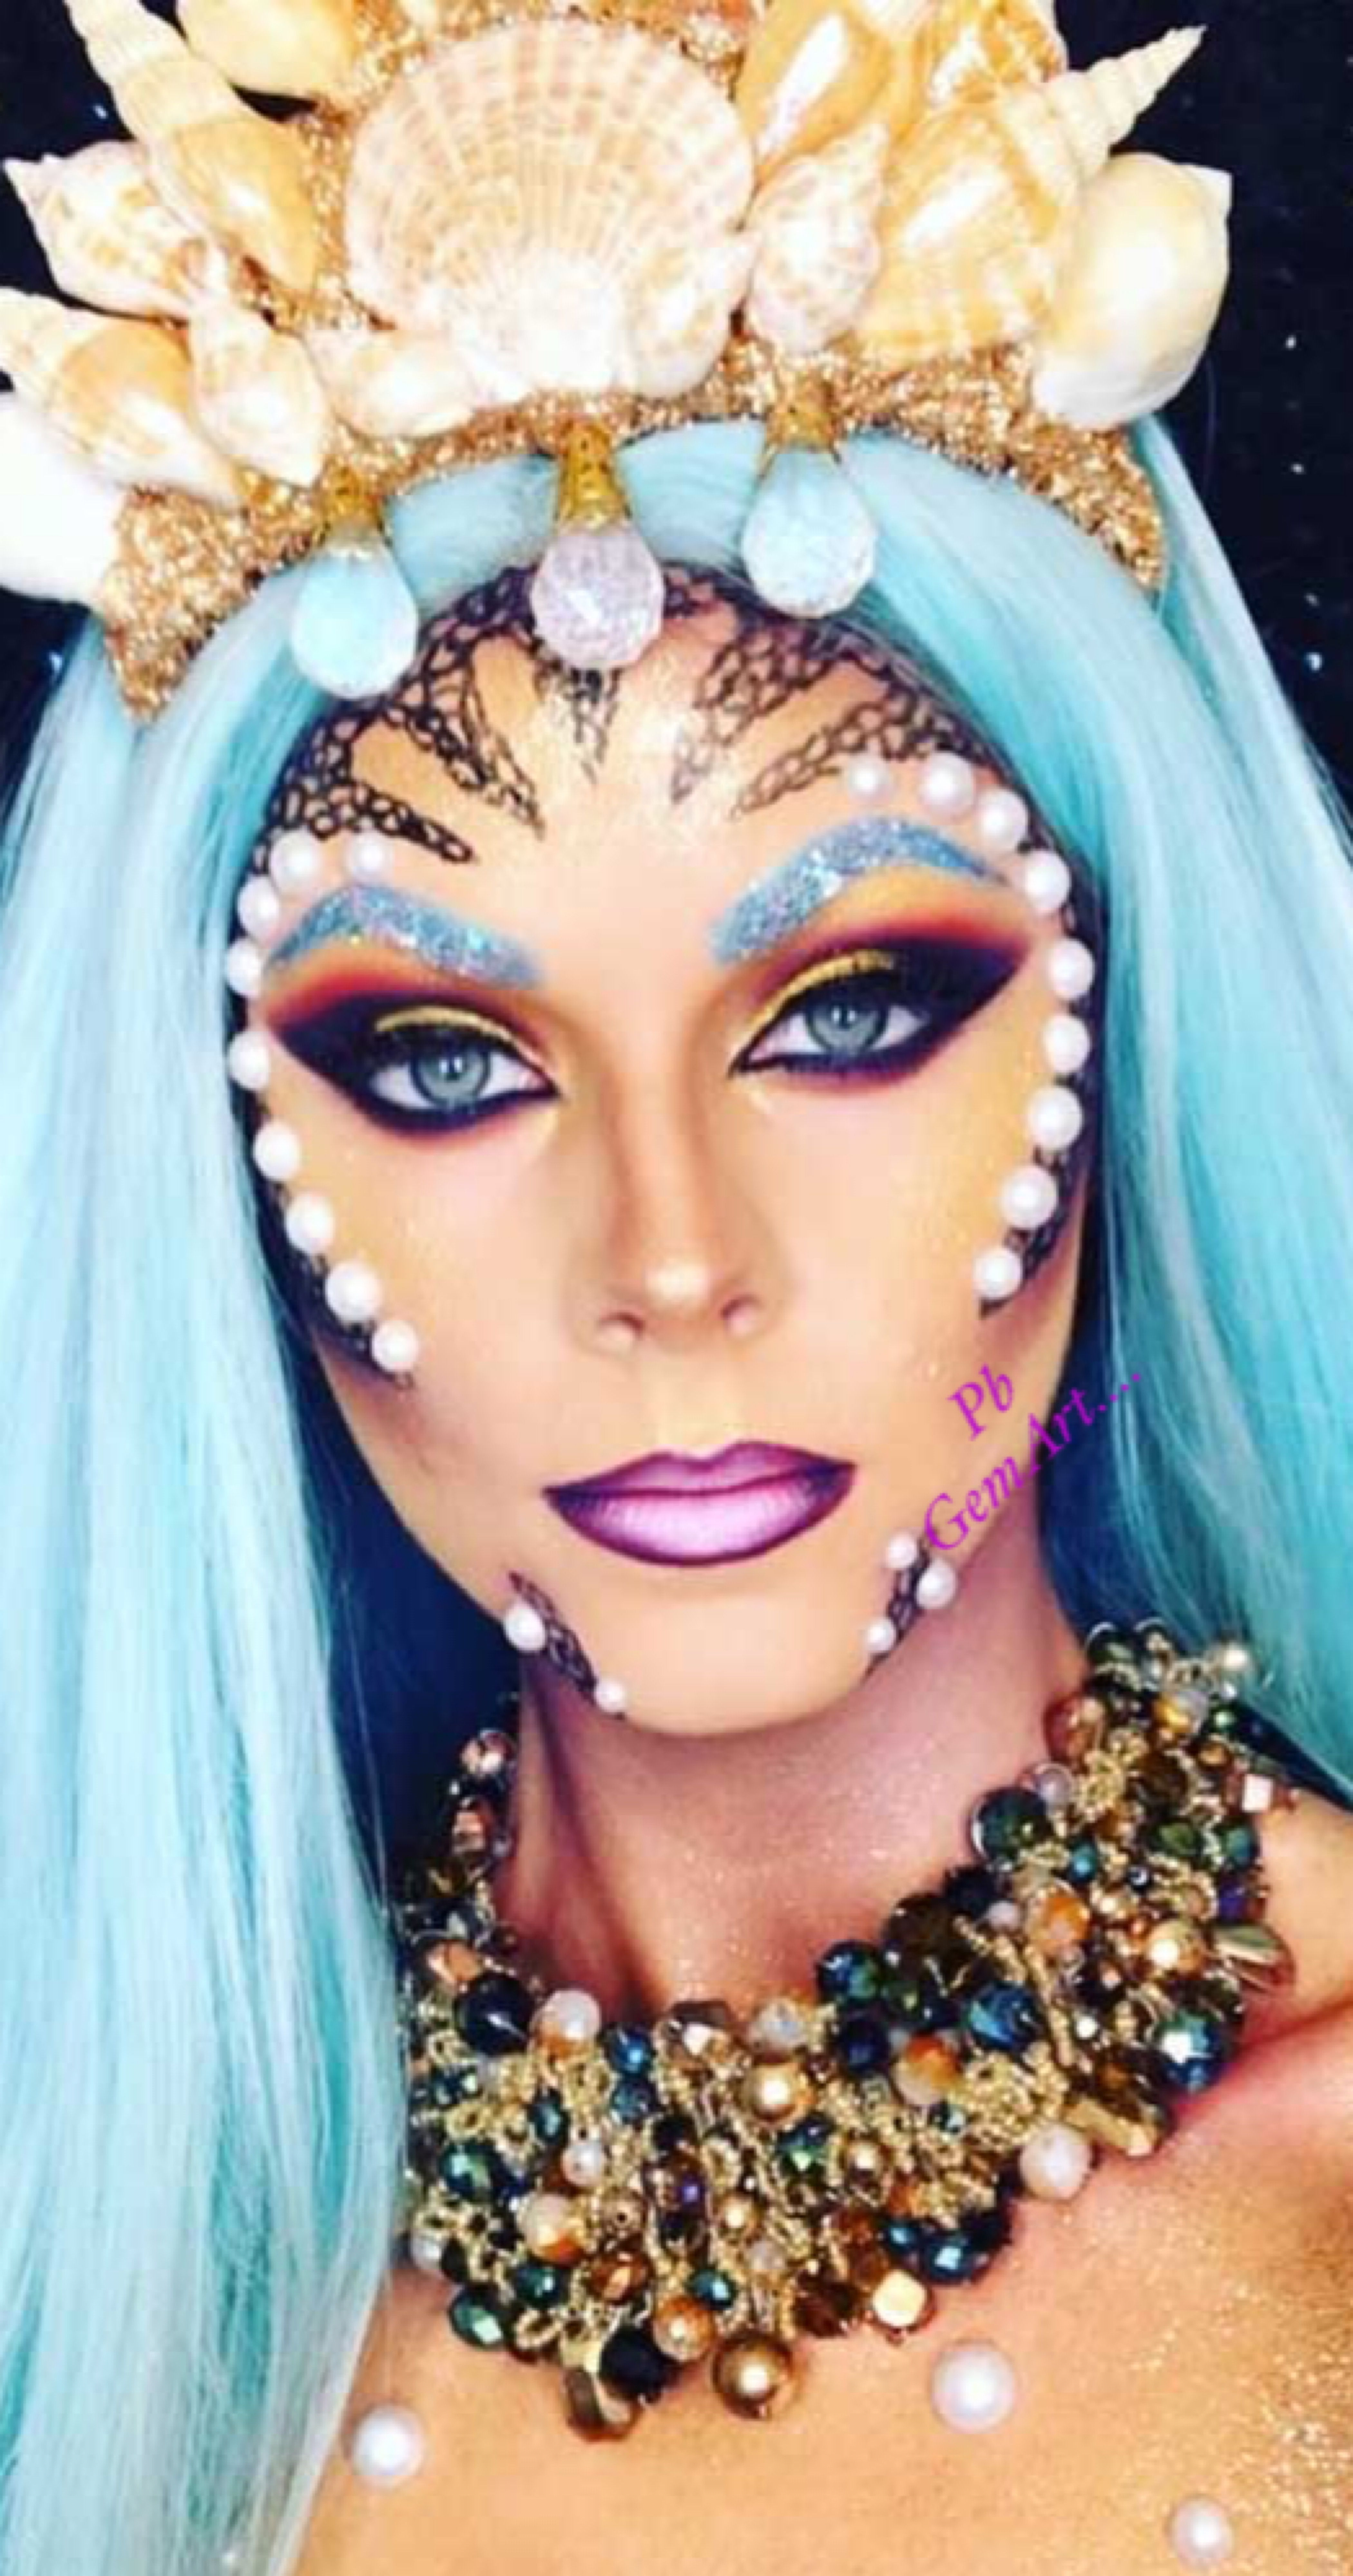 Mermaid Halloween Makeup - The Xerxes